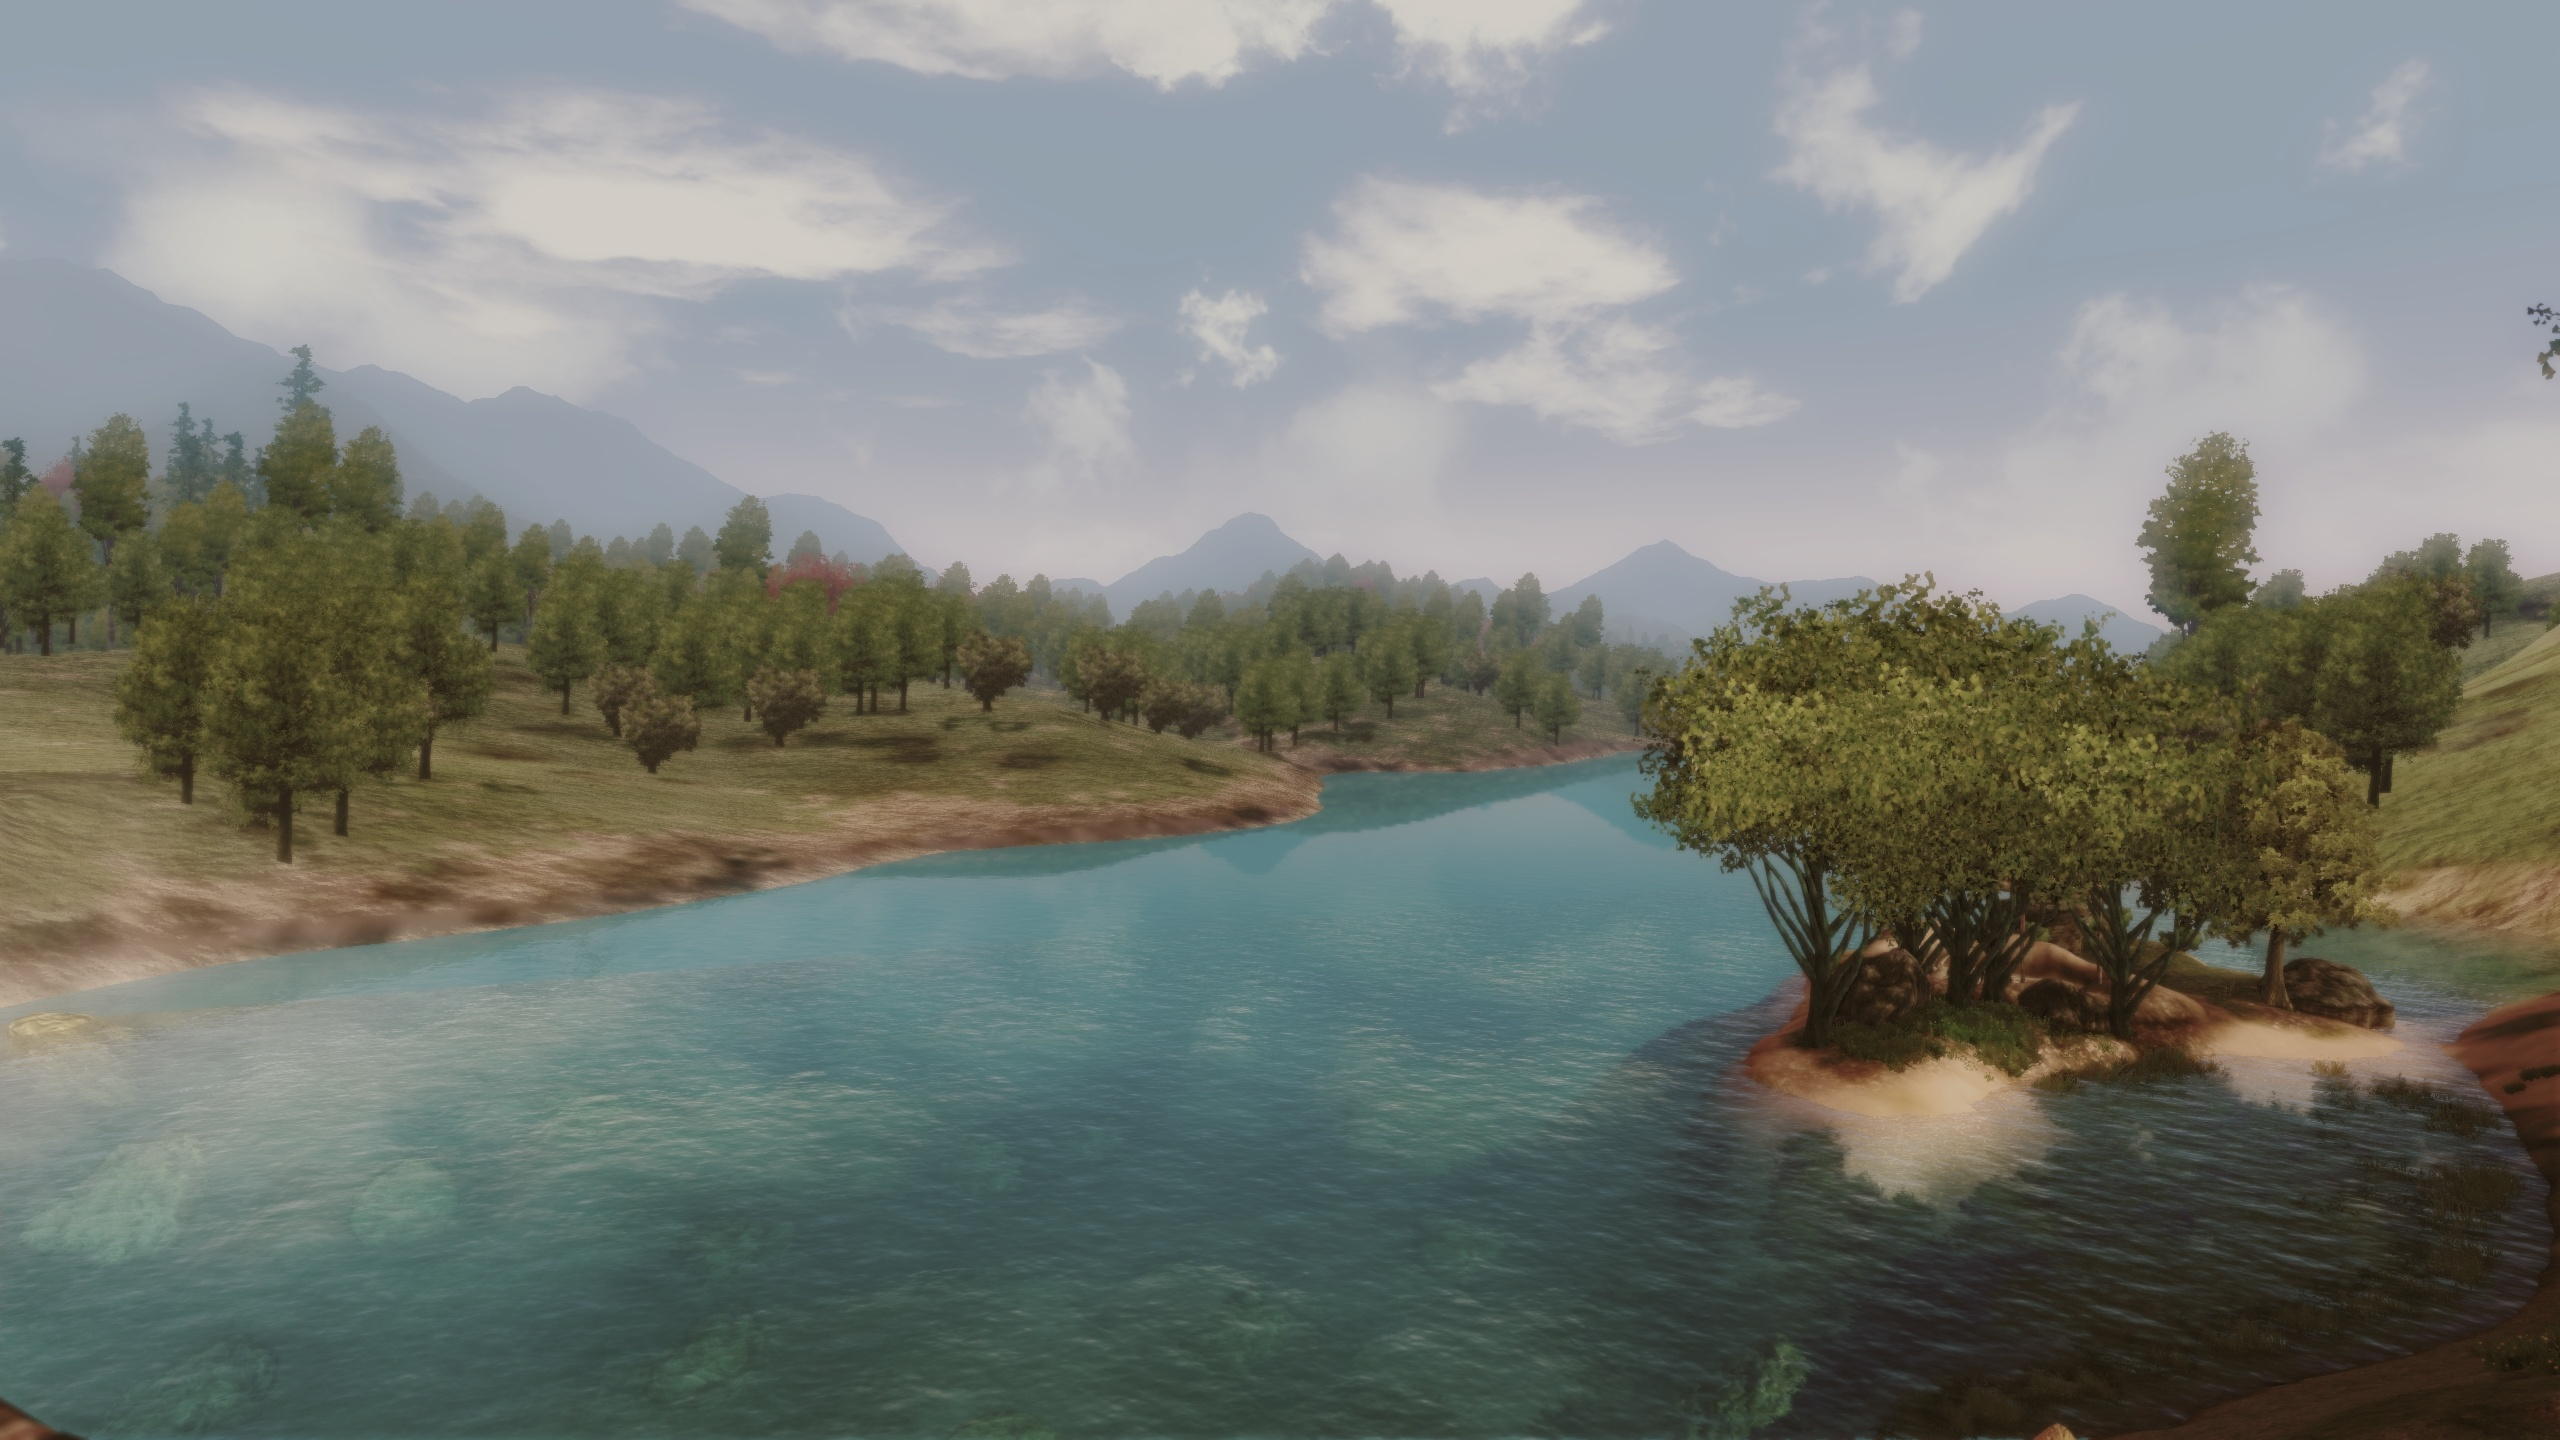 Oblivion Reloaded HD Wallpaper | Background Image | 2560x1440 | ID